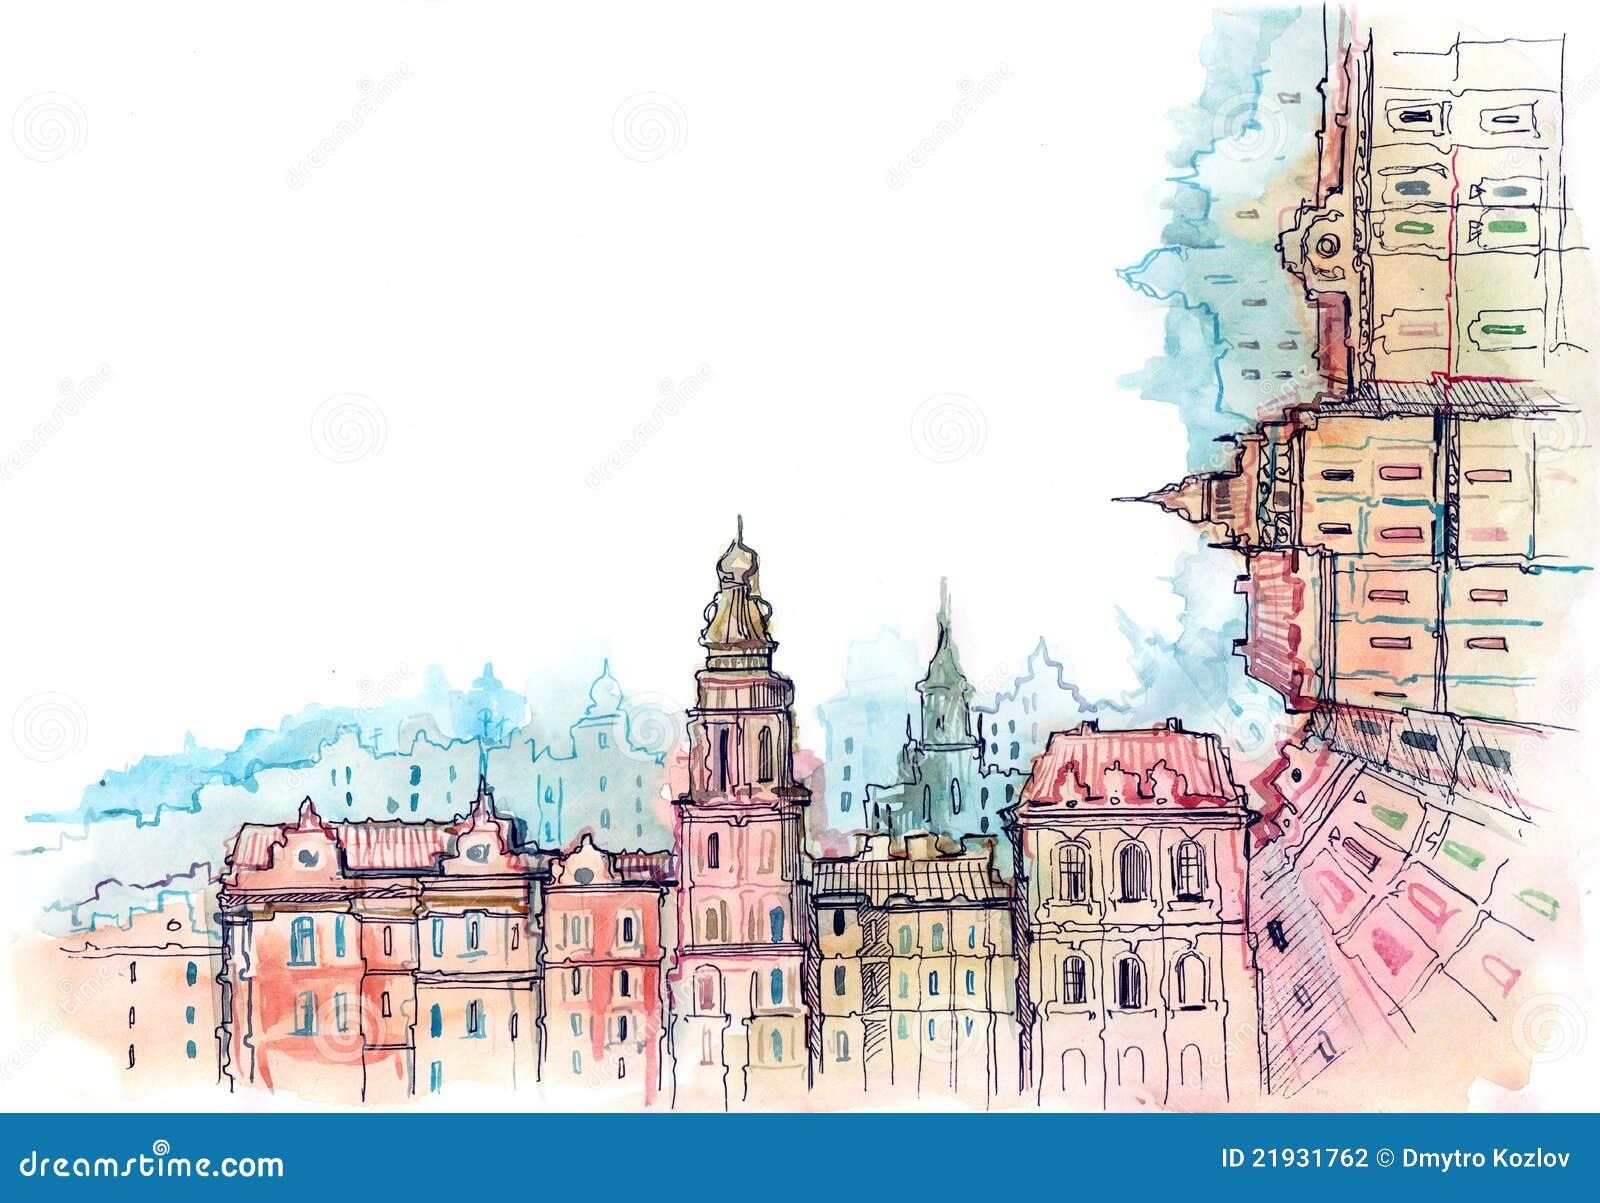 Urban city frame